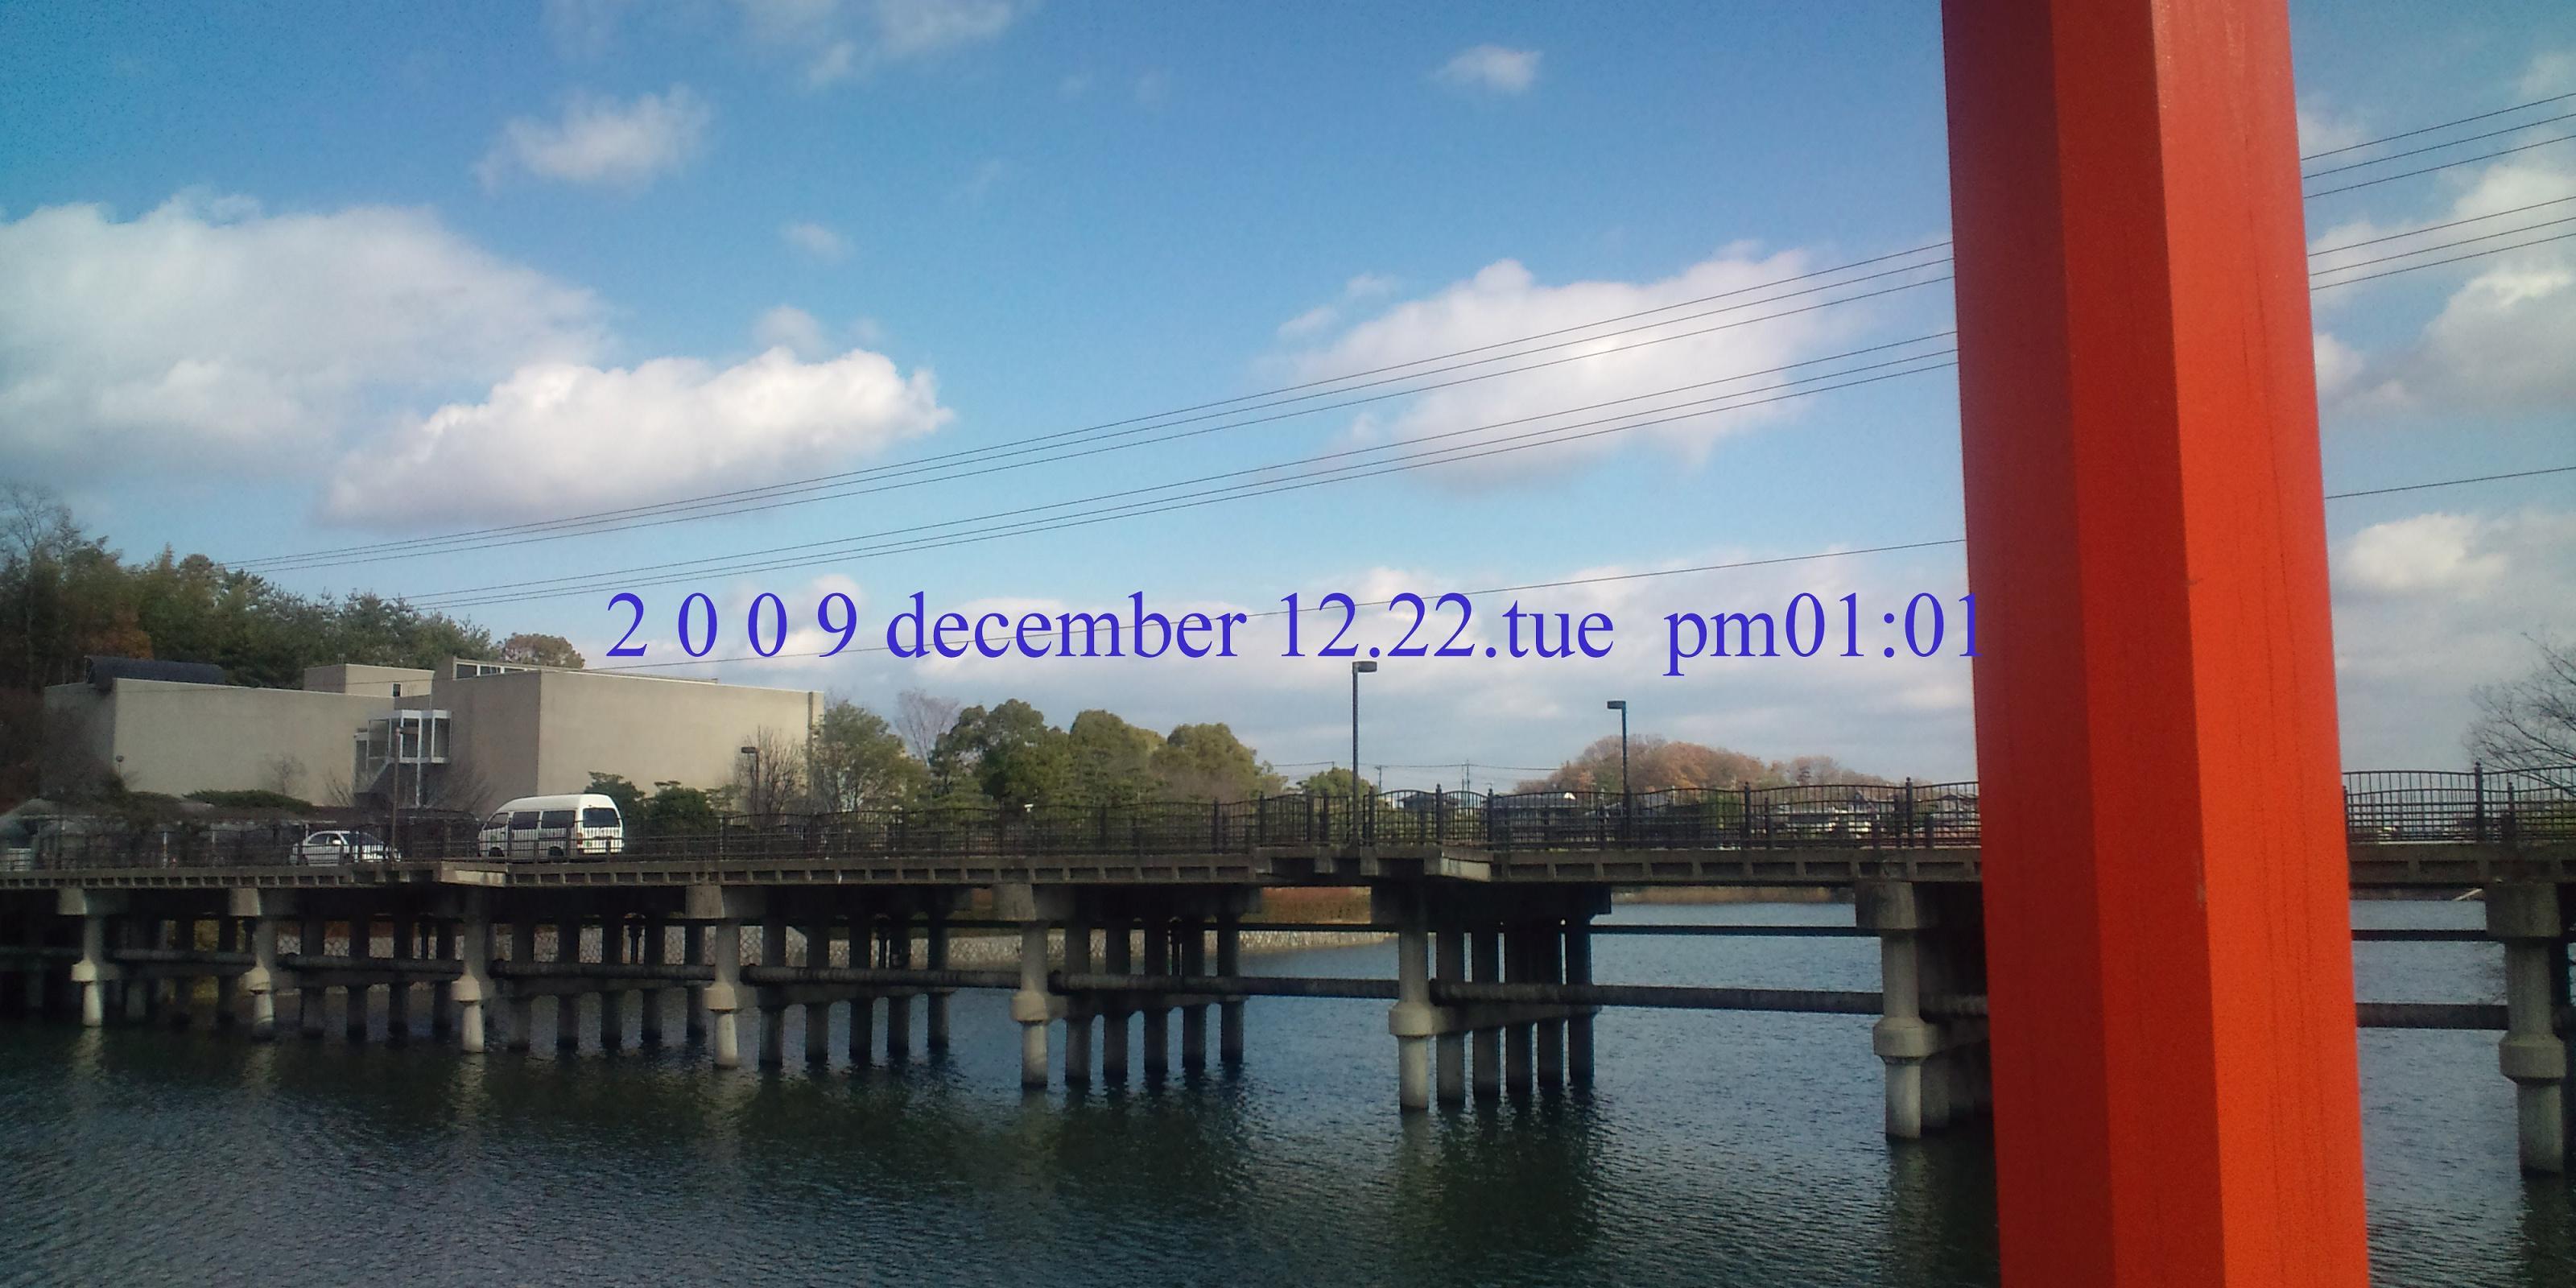 c0220065_19121948.jpg